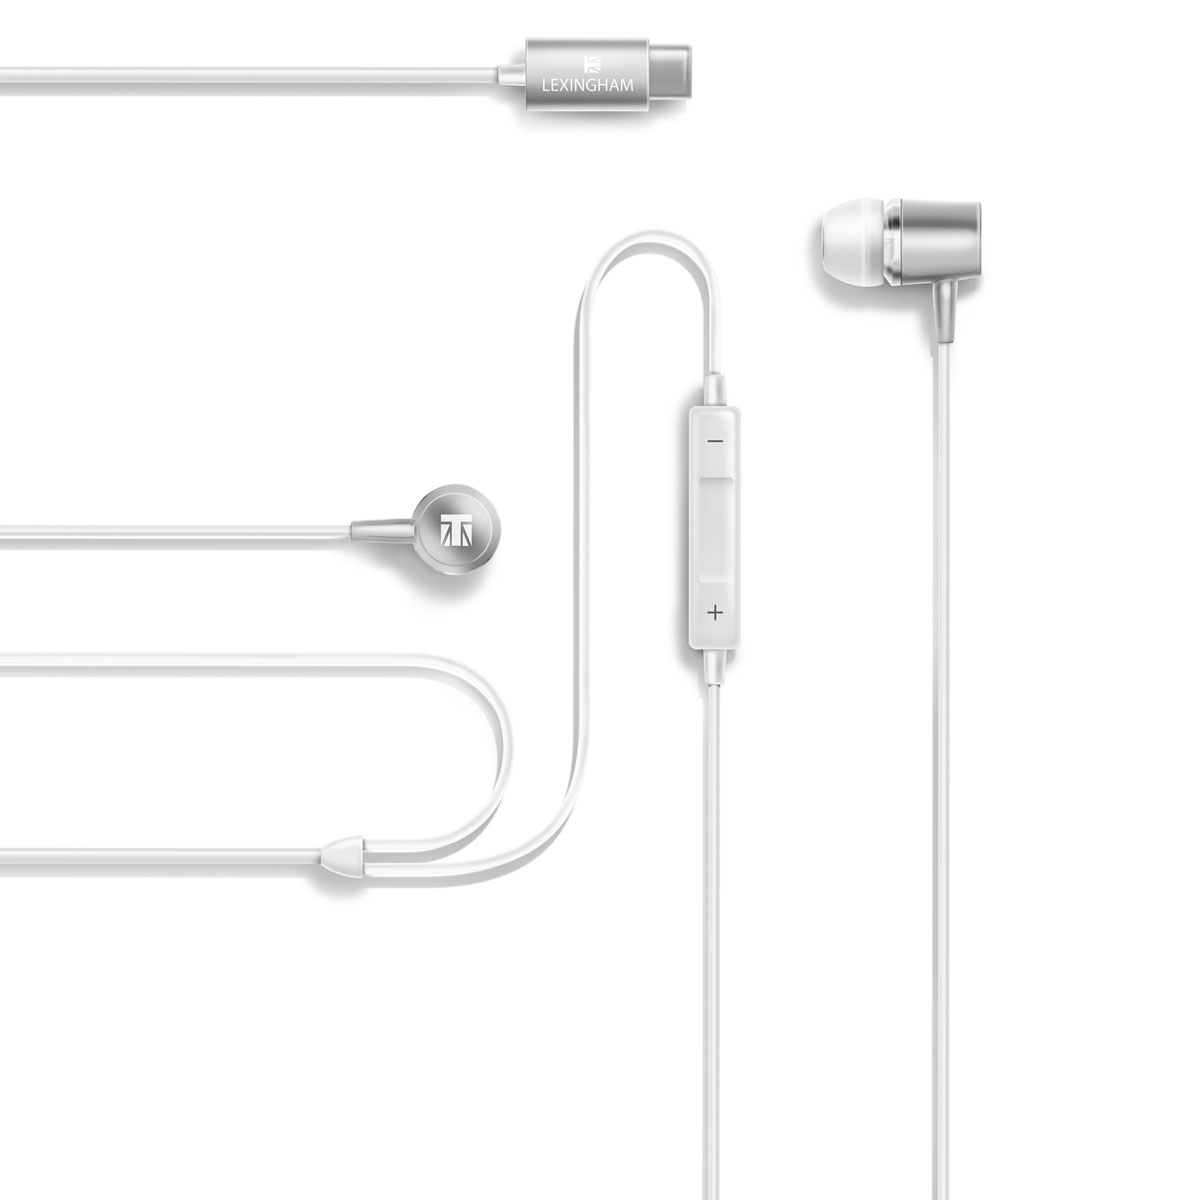 Fones De Ouvido Premium Plugue USB-C Lexingham (Branco, Único)